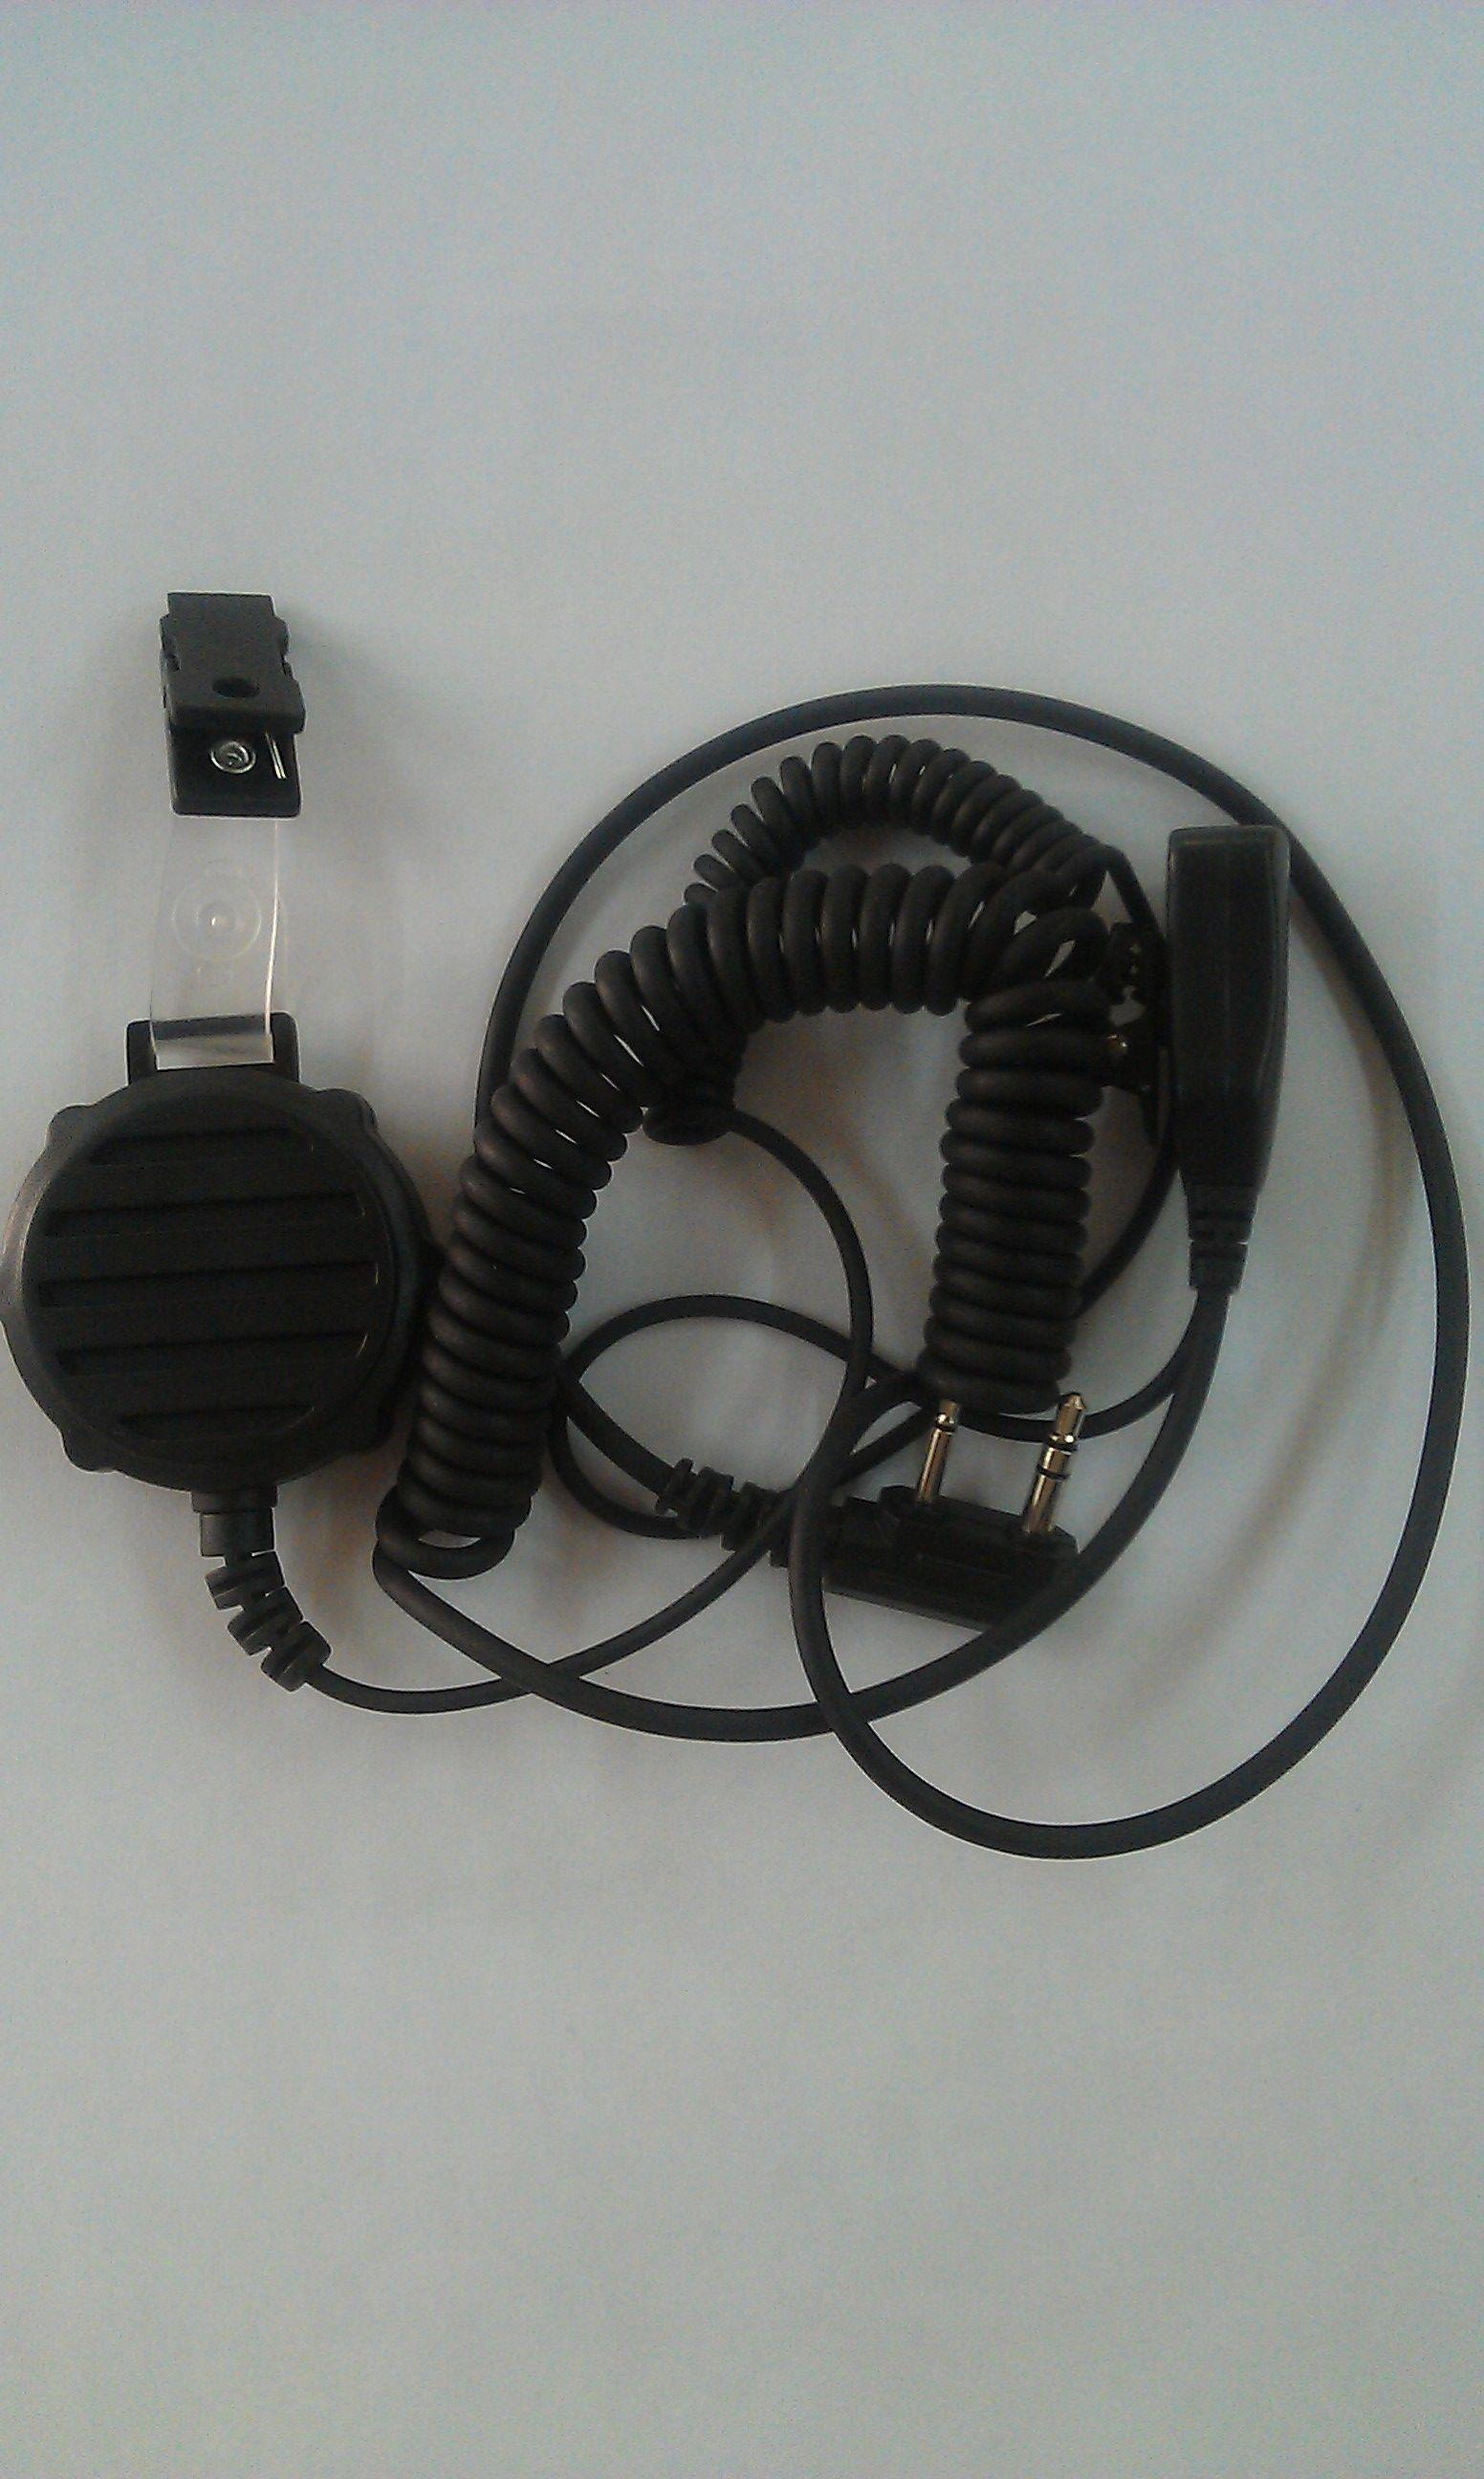 MICRO-ALTAVOZ EXTENSIBLE: Catálogo de Olanni Electronics